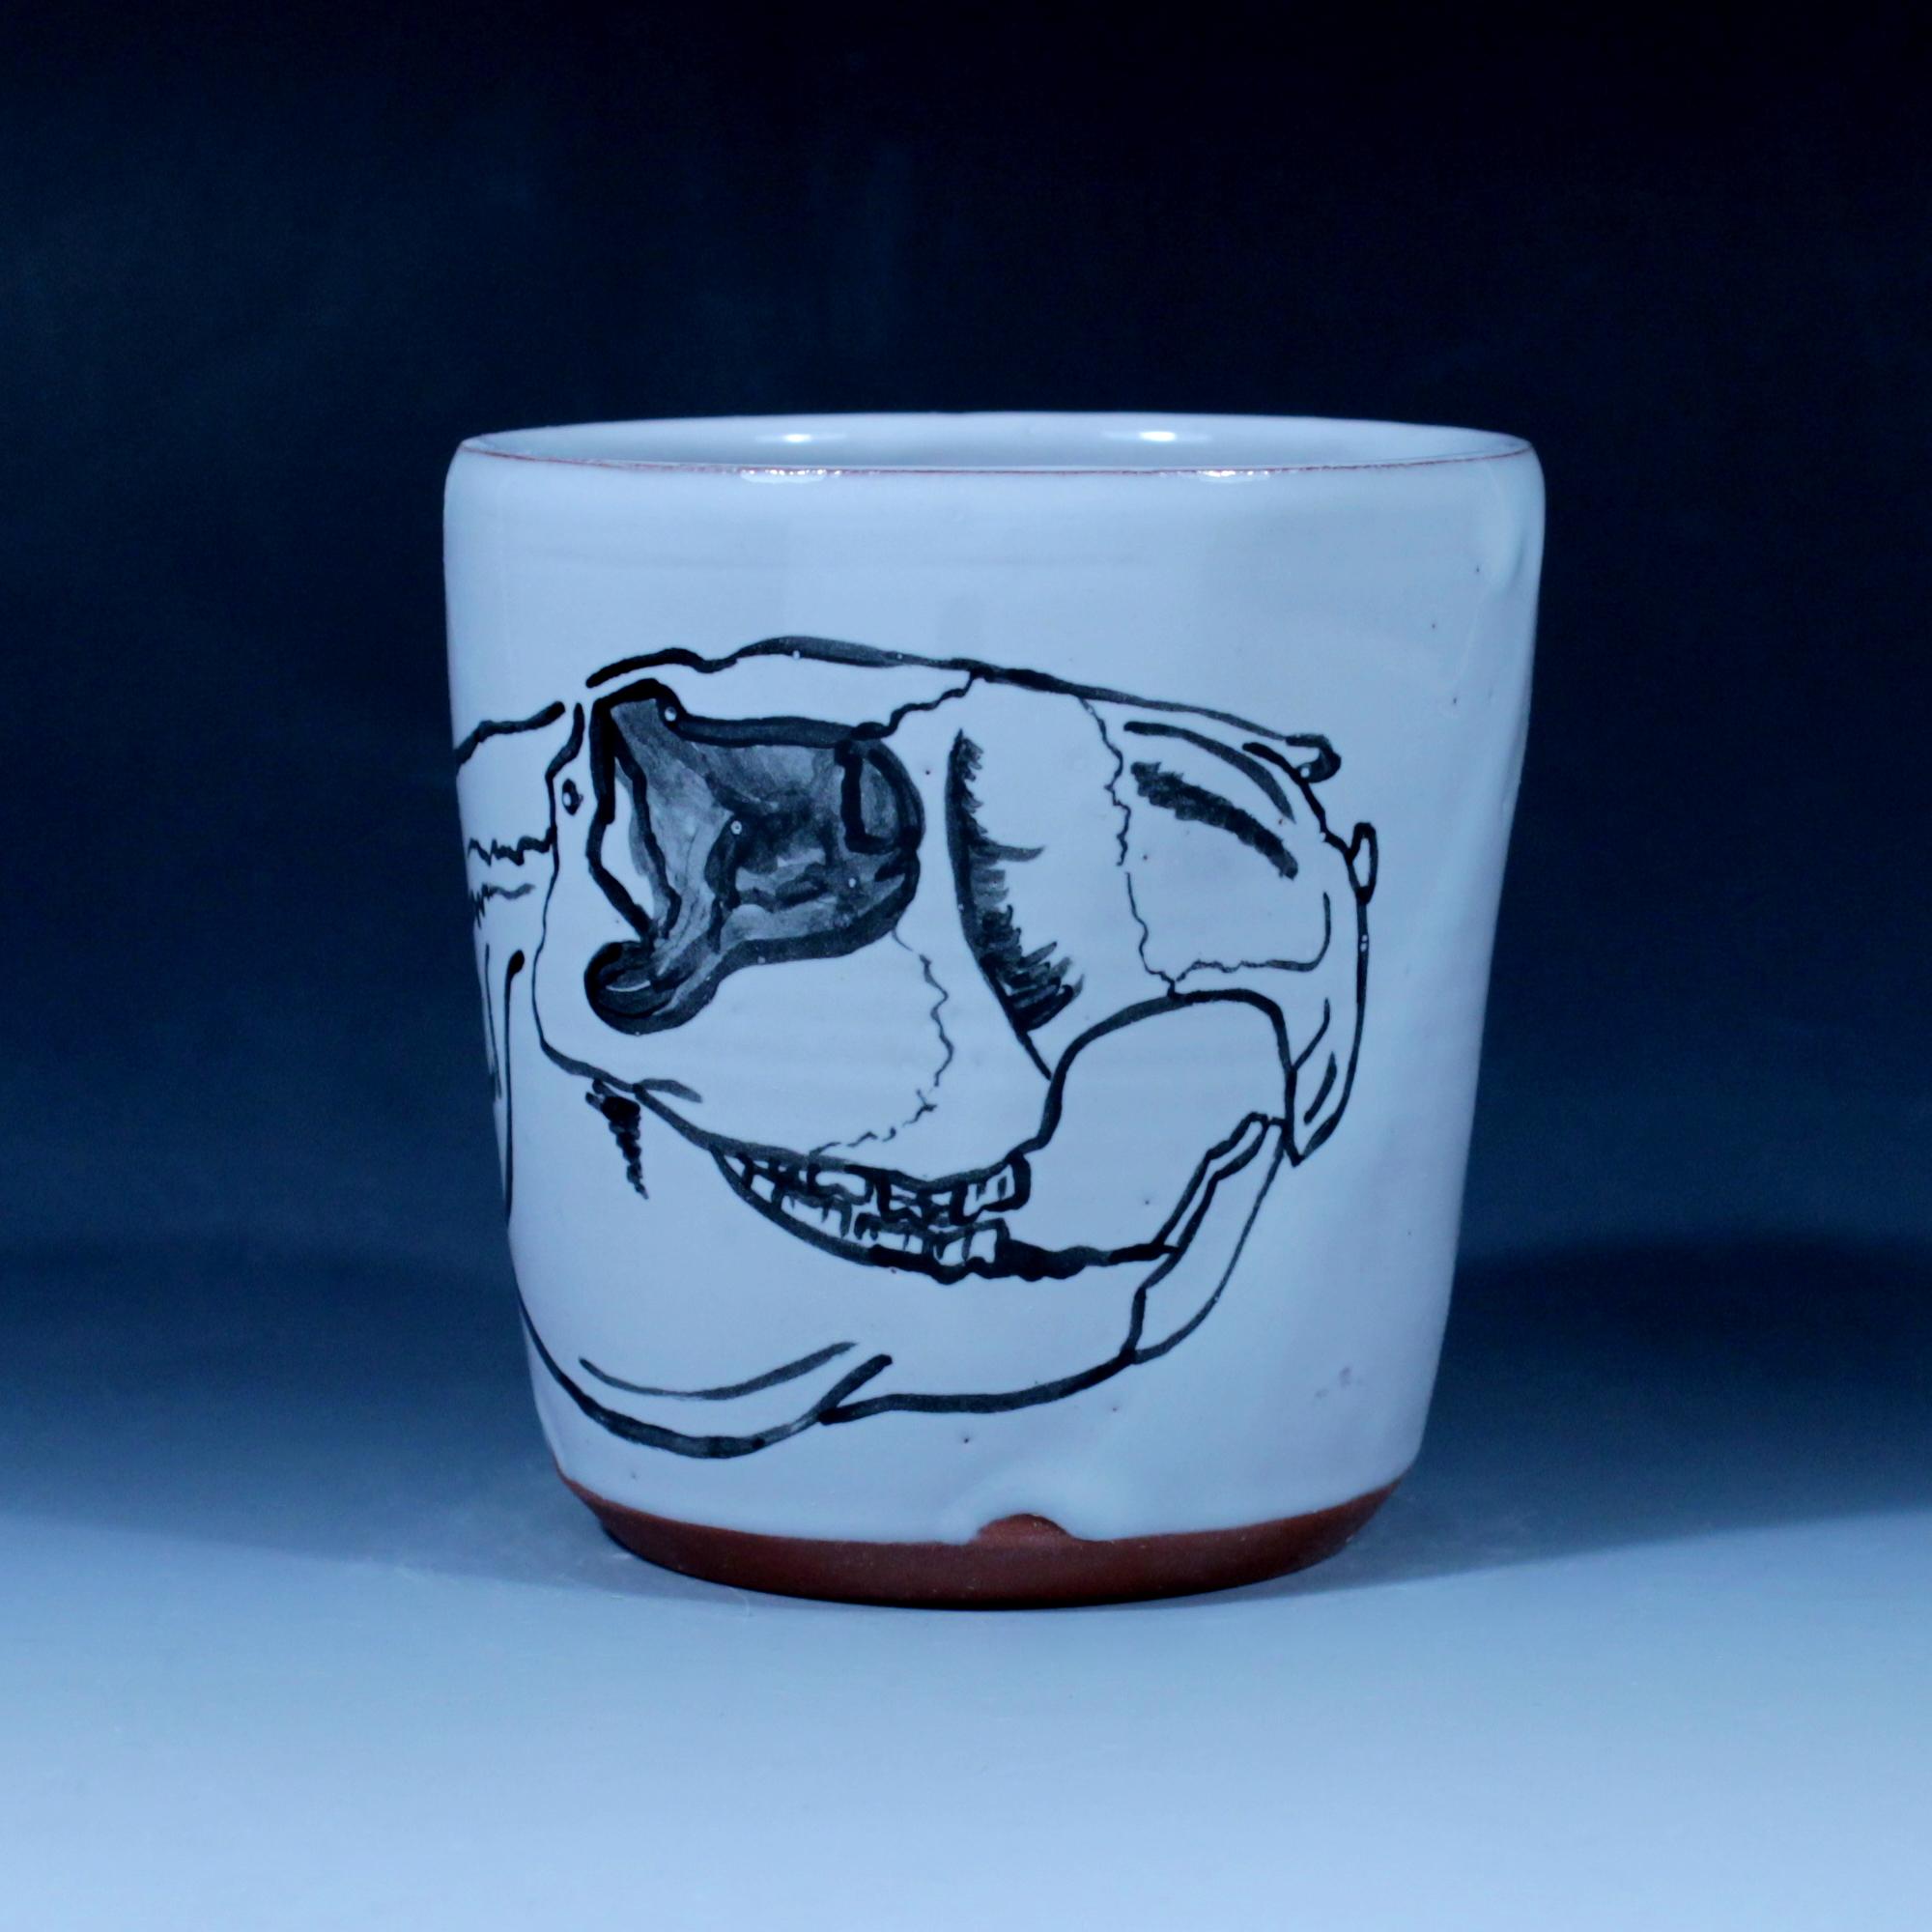 cupcapybarablue03.JPG